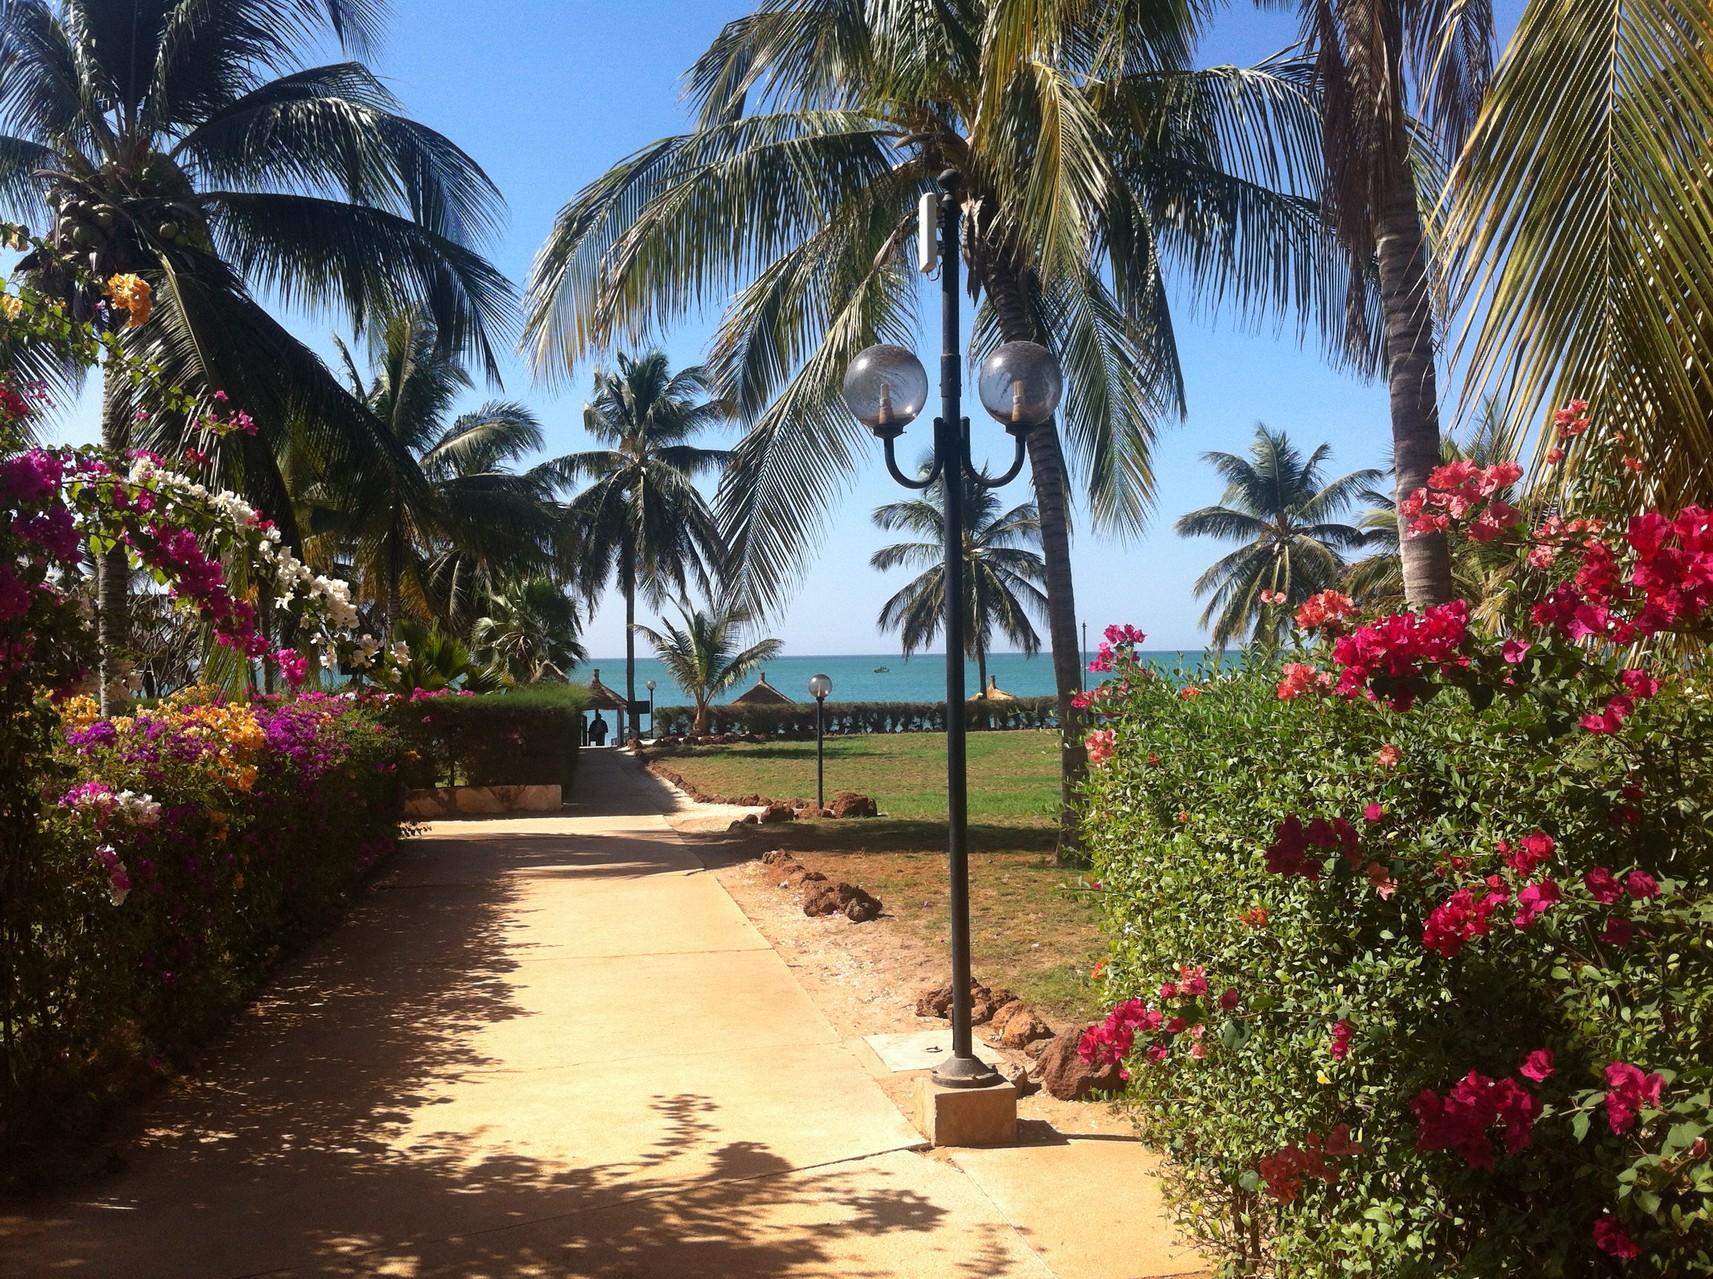 Le chemin qui mène à la plage